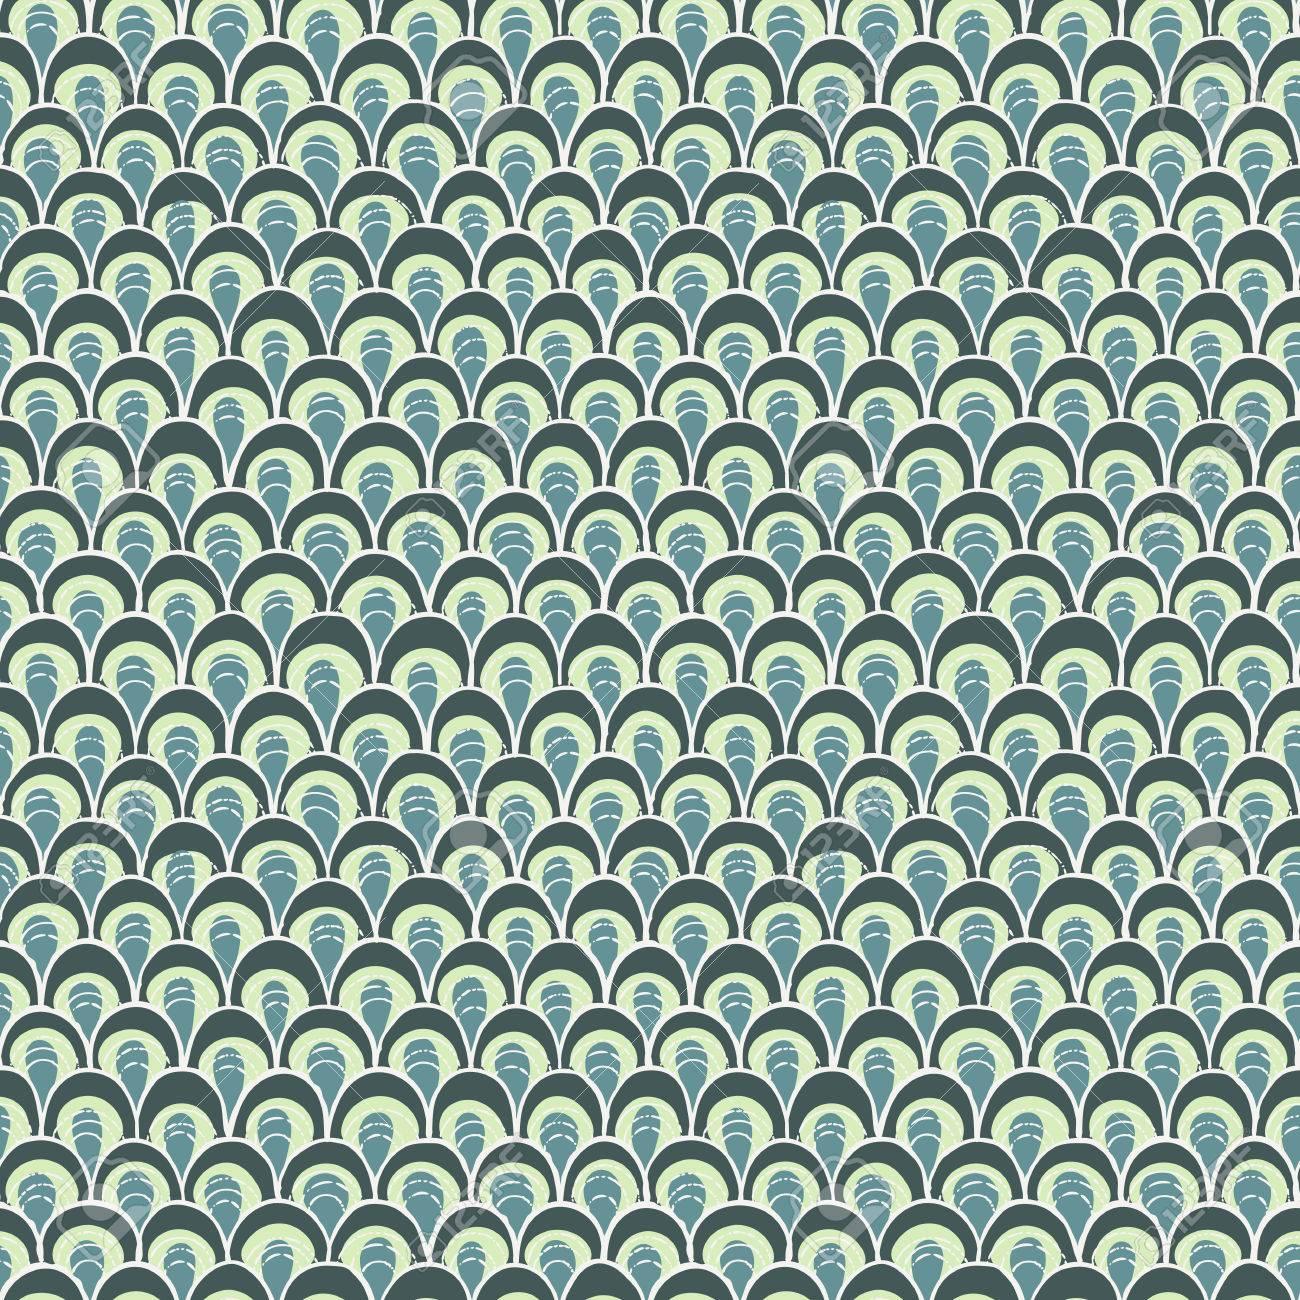 Texture For Web Prints Wallpaper Home Decor